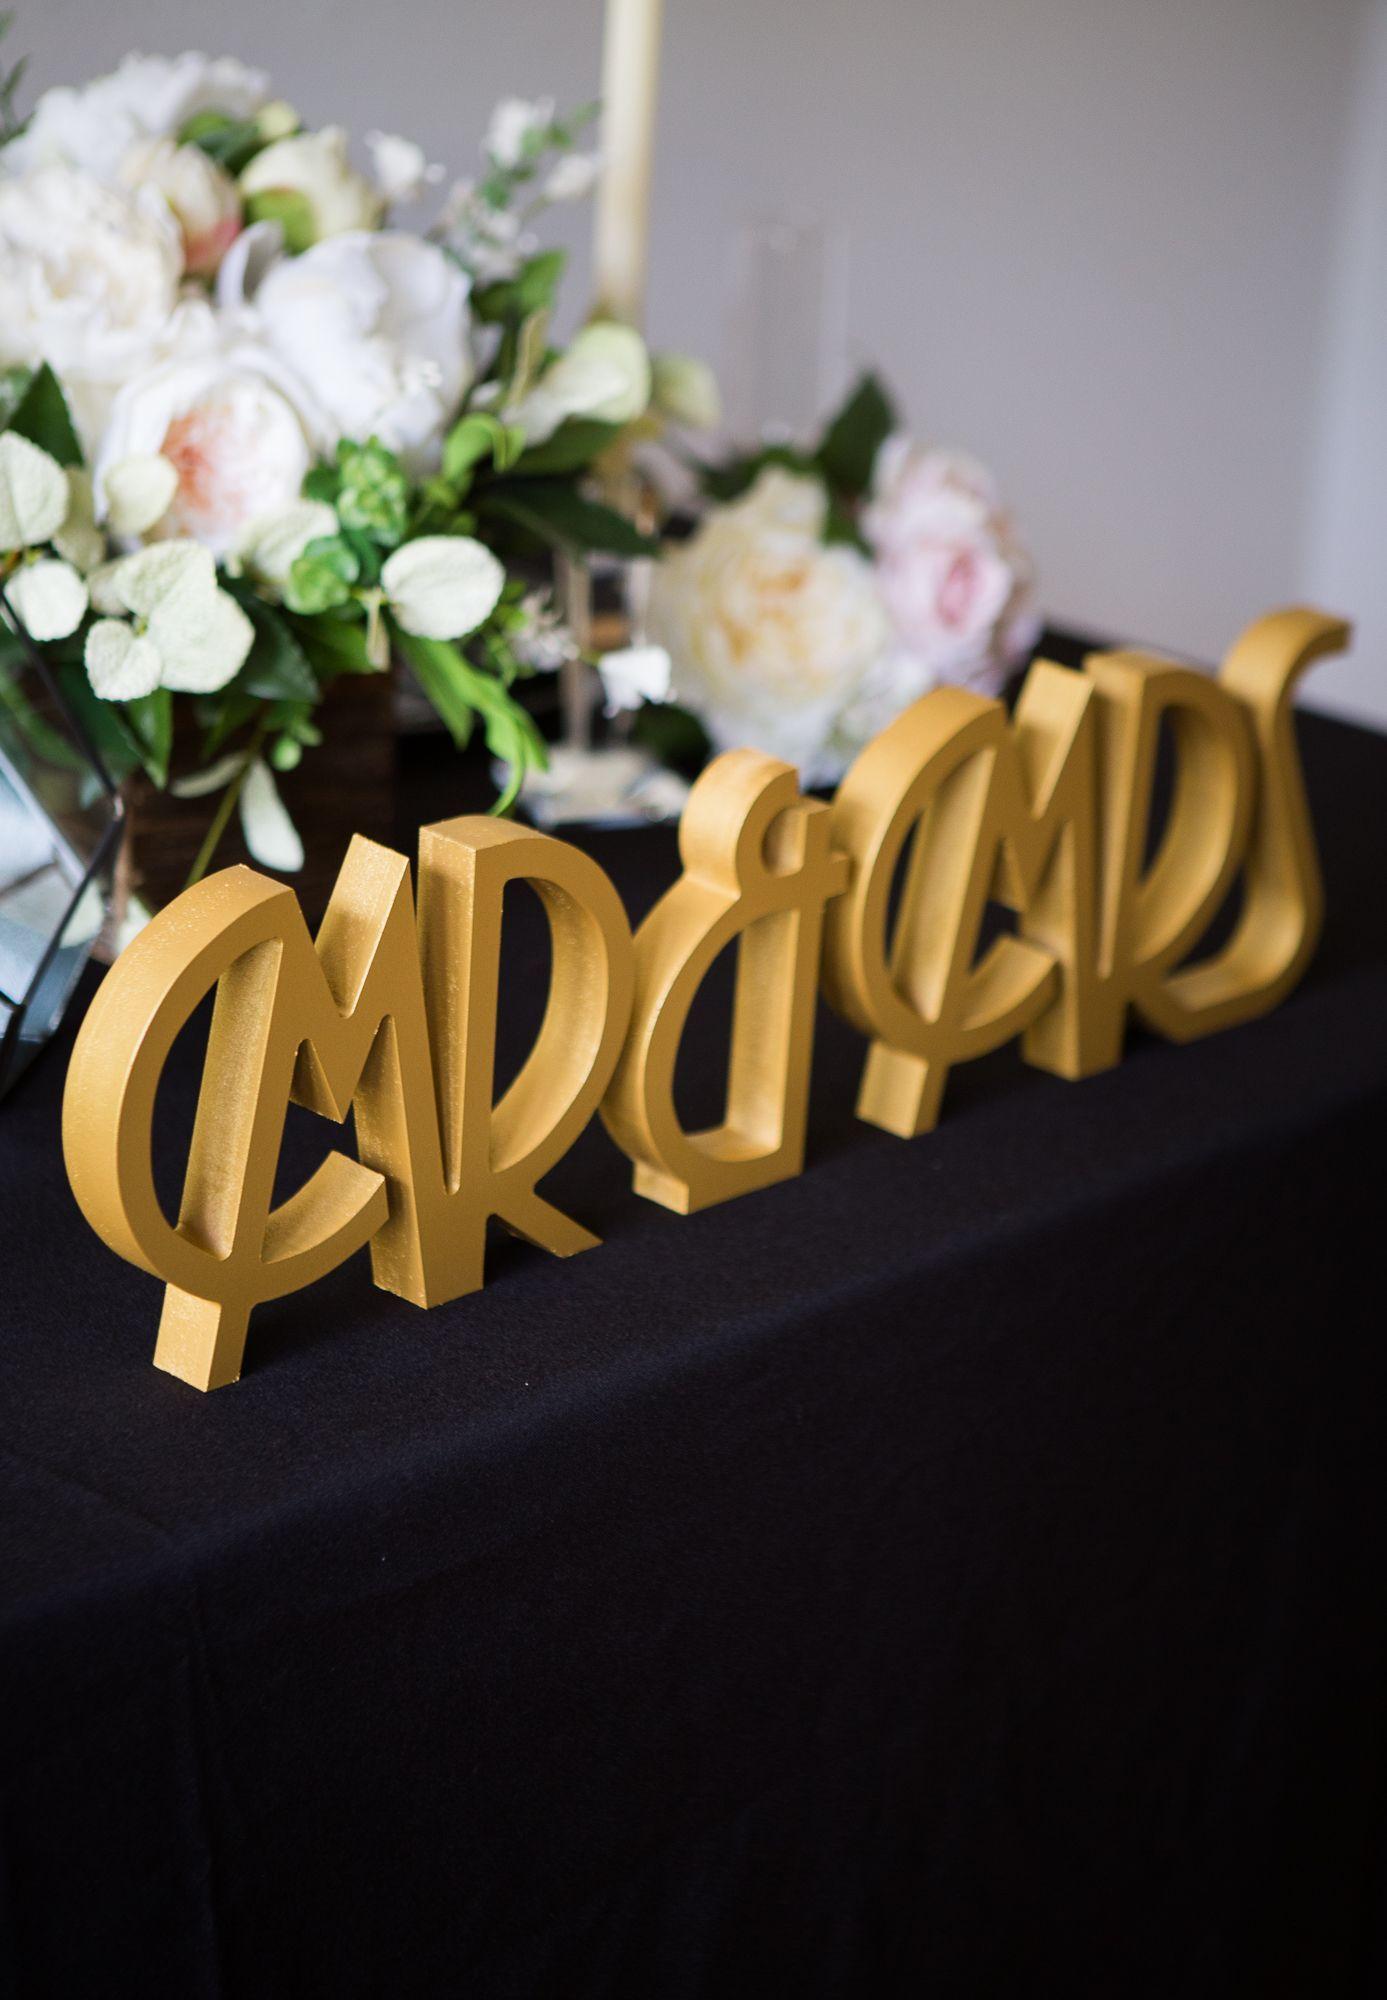 Diy vintage wedding decoration ideas  Find Your Wedding Style  Great Gatsby Inspired Wedding Decor for